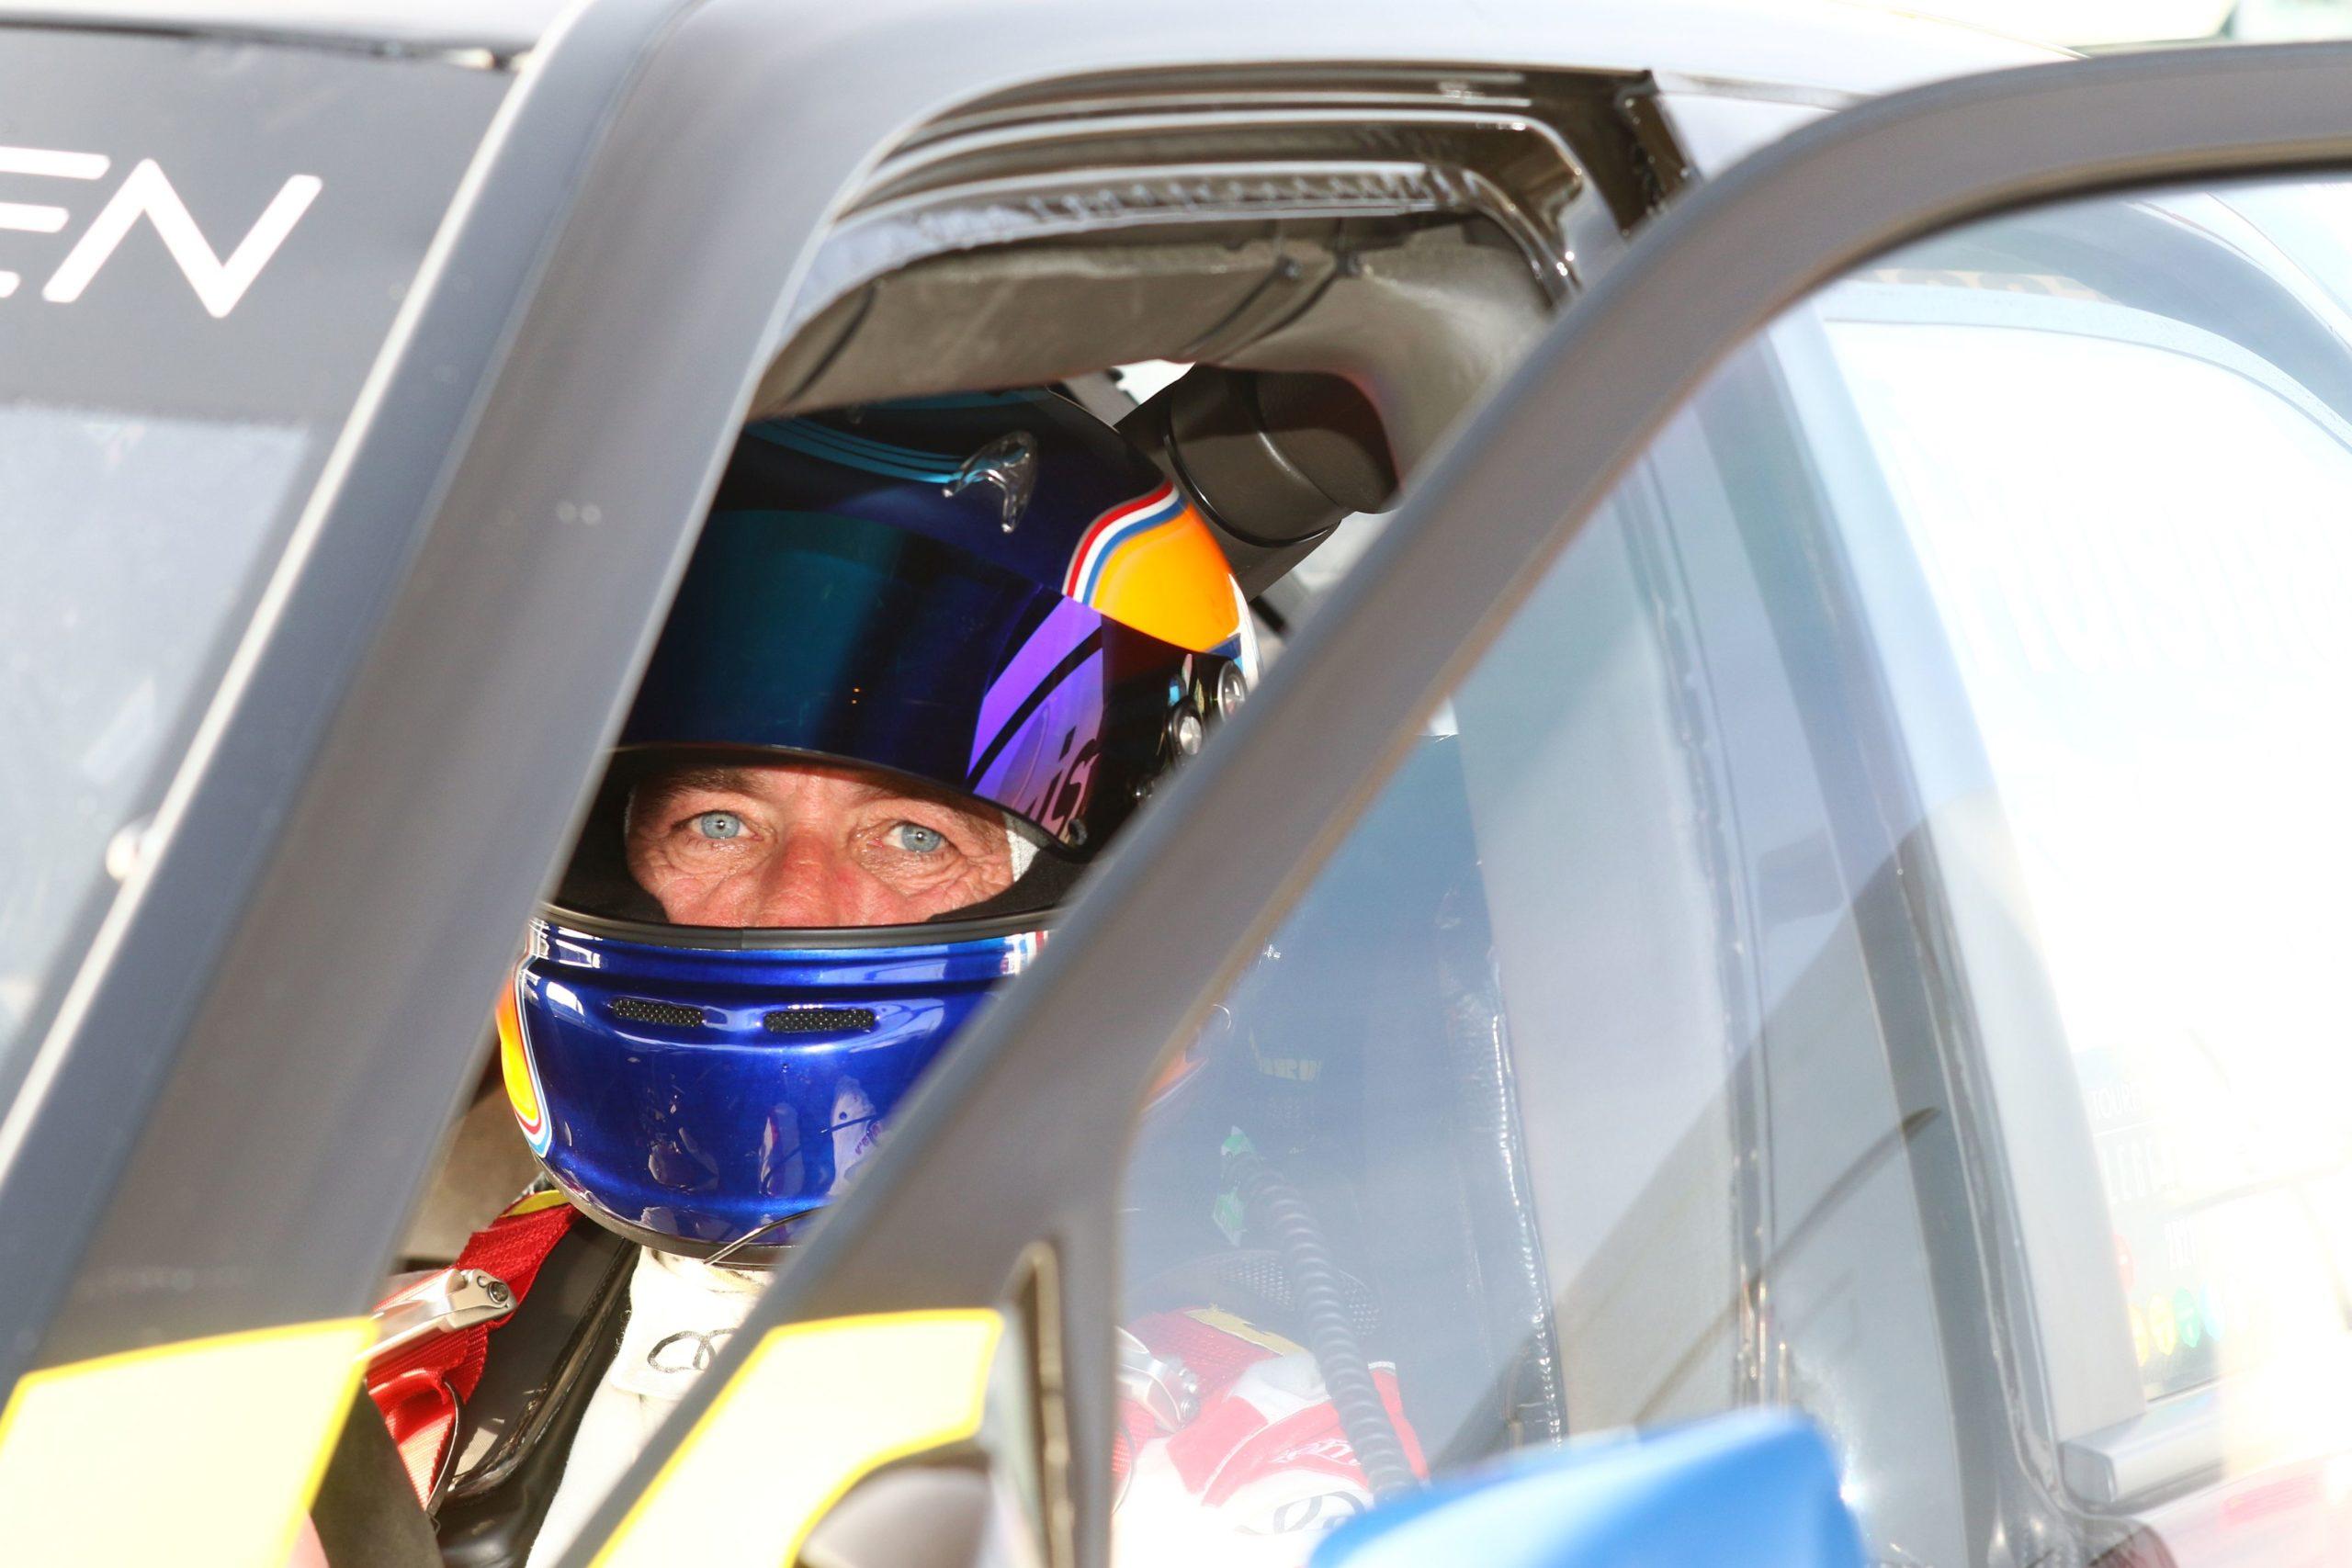 DTM-Classic-tst-sport-und-technik-Mercedes-Benz-Patrick-Huisman-2128172